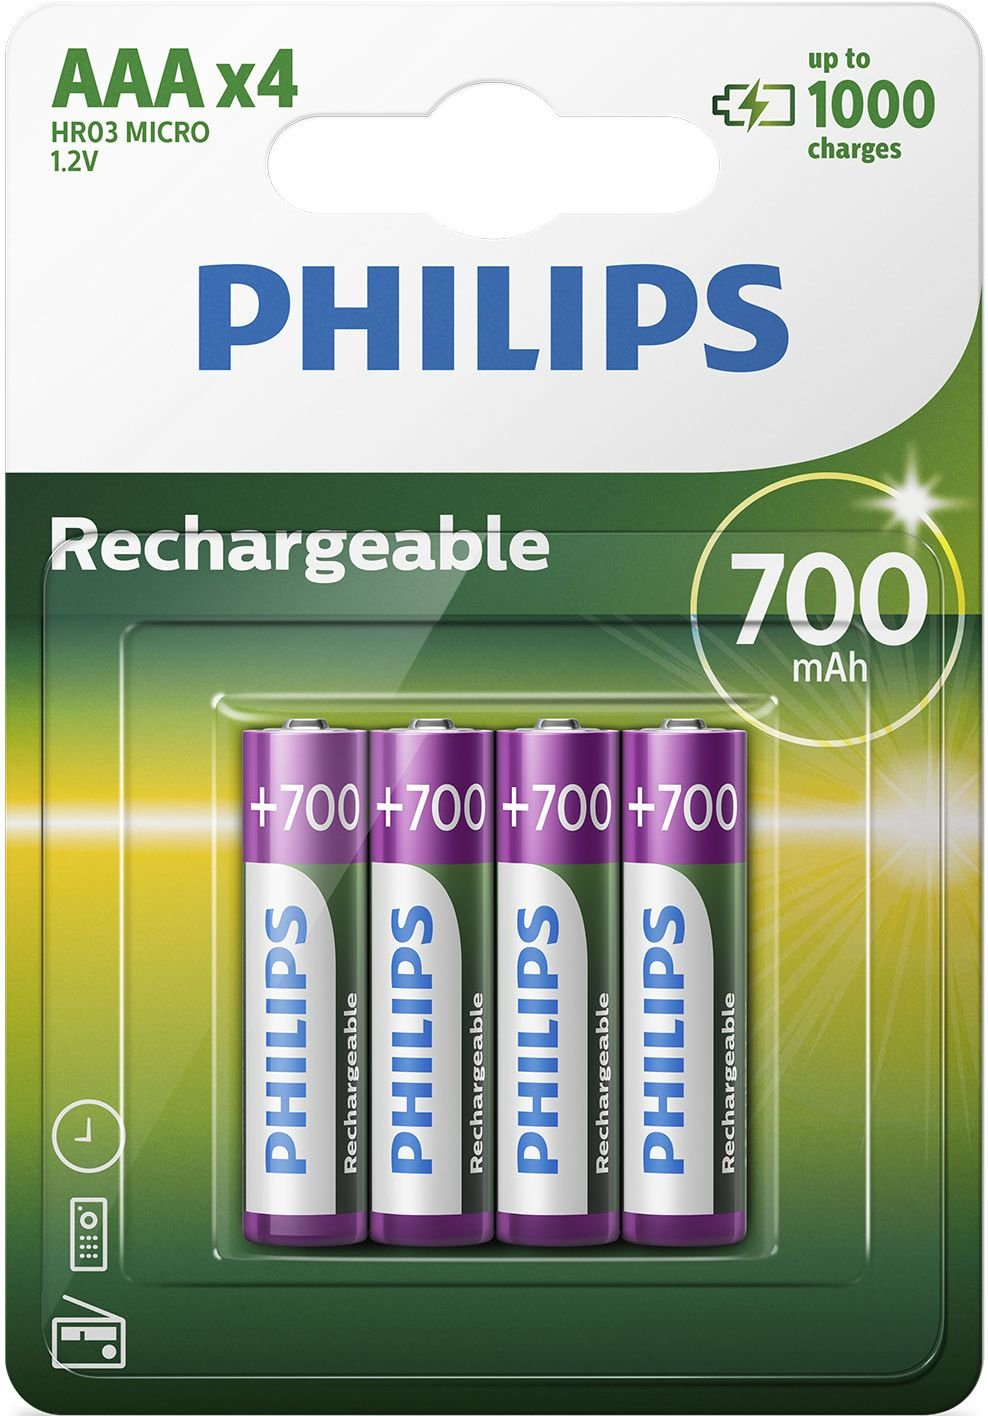 700 mAh Bater/ía micro AAA de Philips